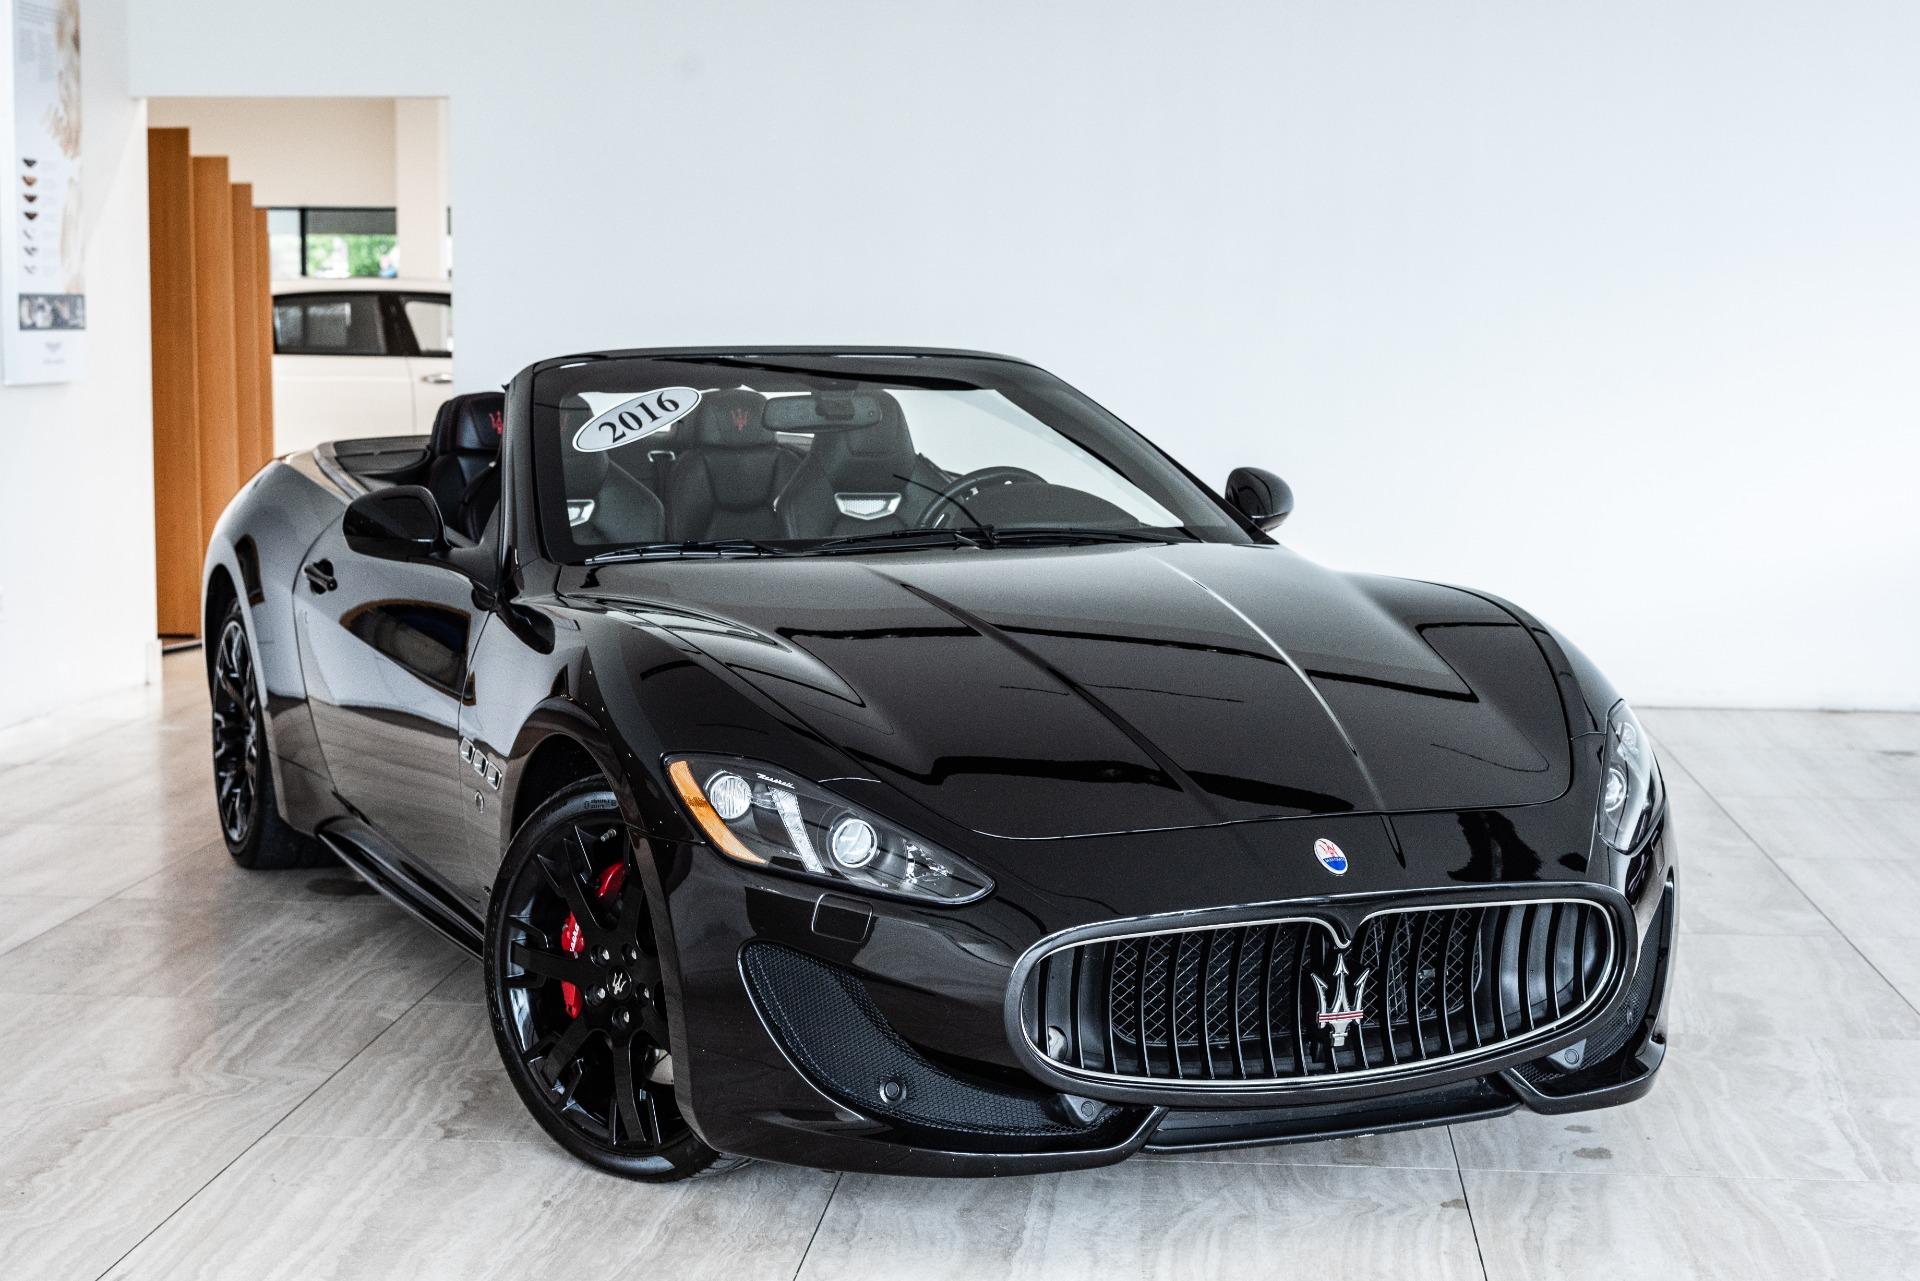 2016 Maserati Granturismo Mc Stock P0177500 For Sale Near Vienna Va Va Maserati Dealer For Sale In Vienna Va P0177500 Exclusive Automotive Group